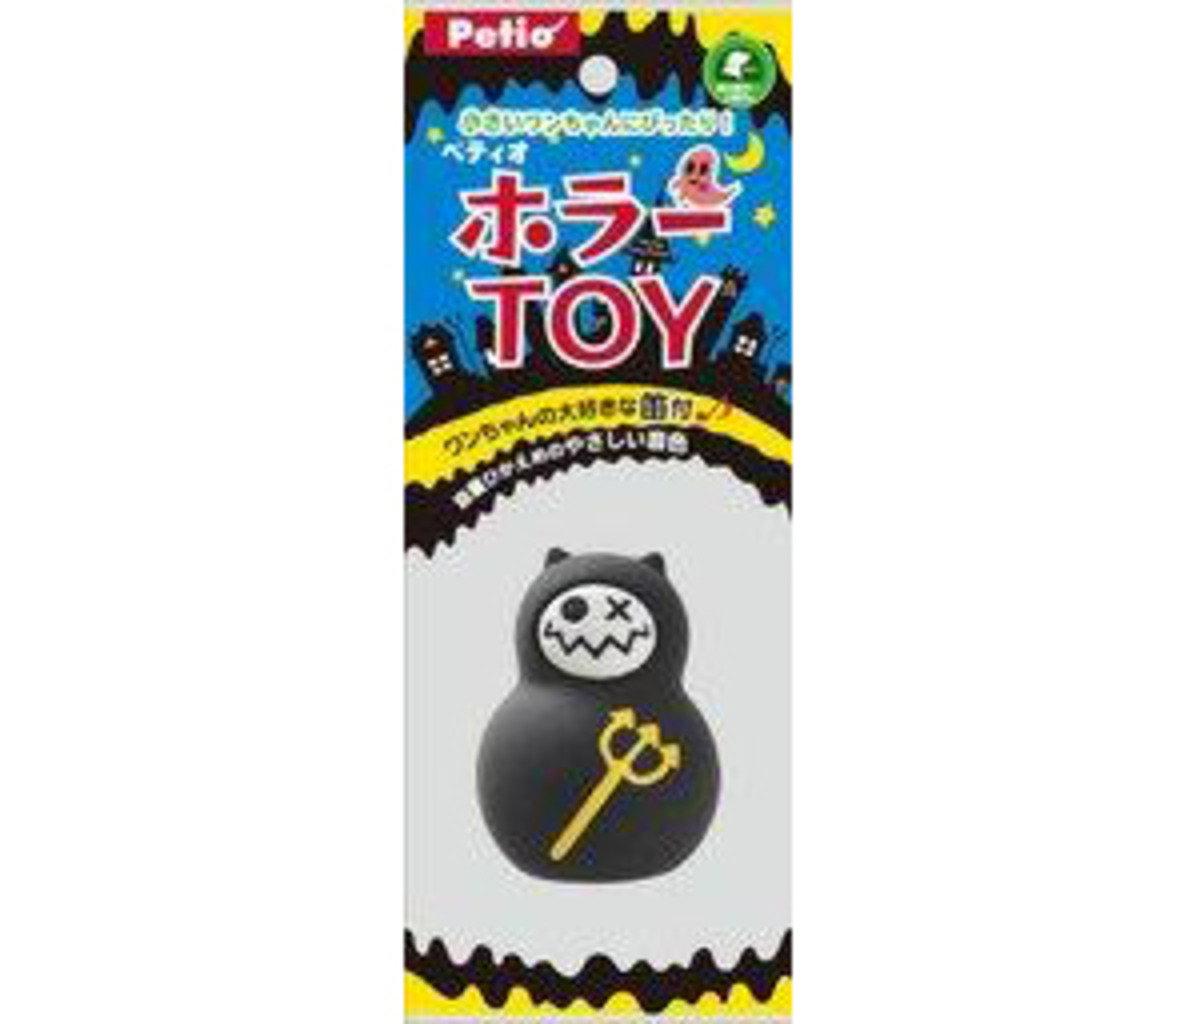 PO23590 日本 PETIO 發聲玩具 - 小黑魔